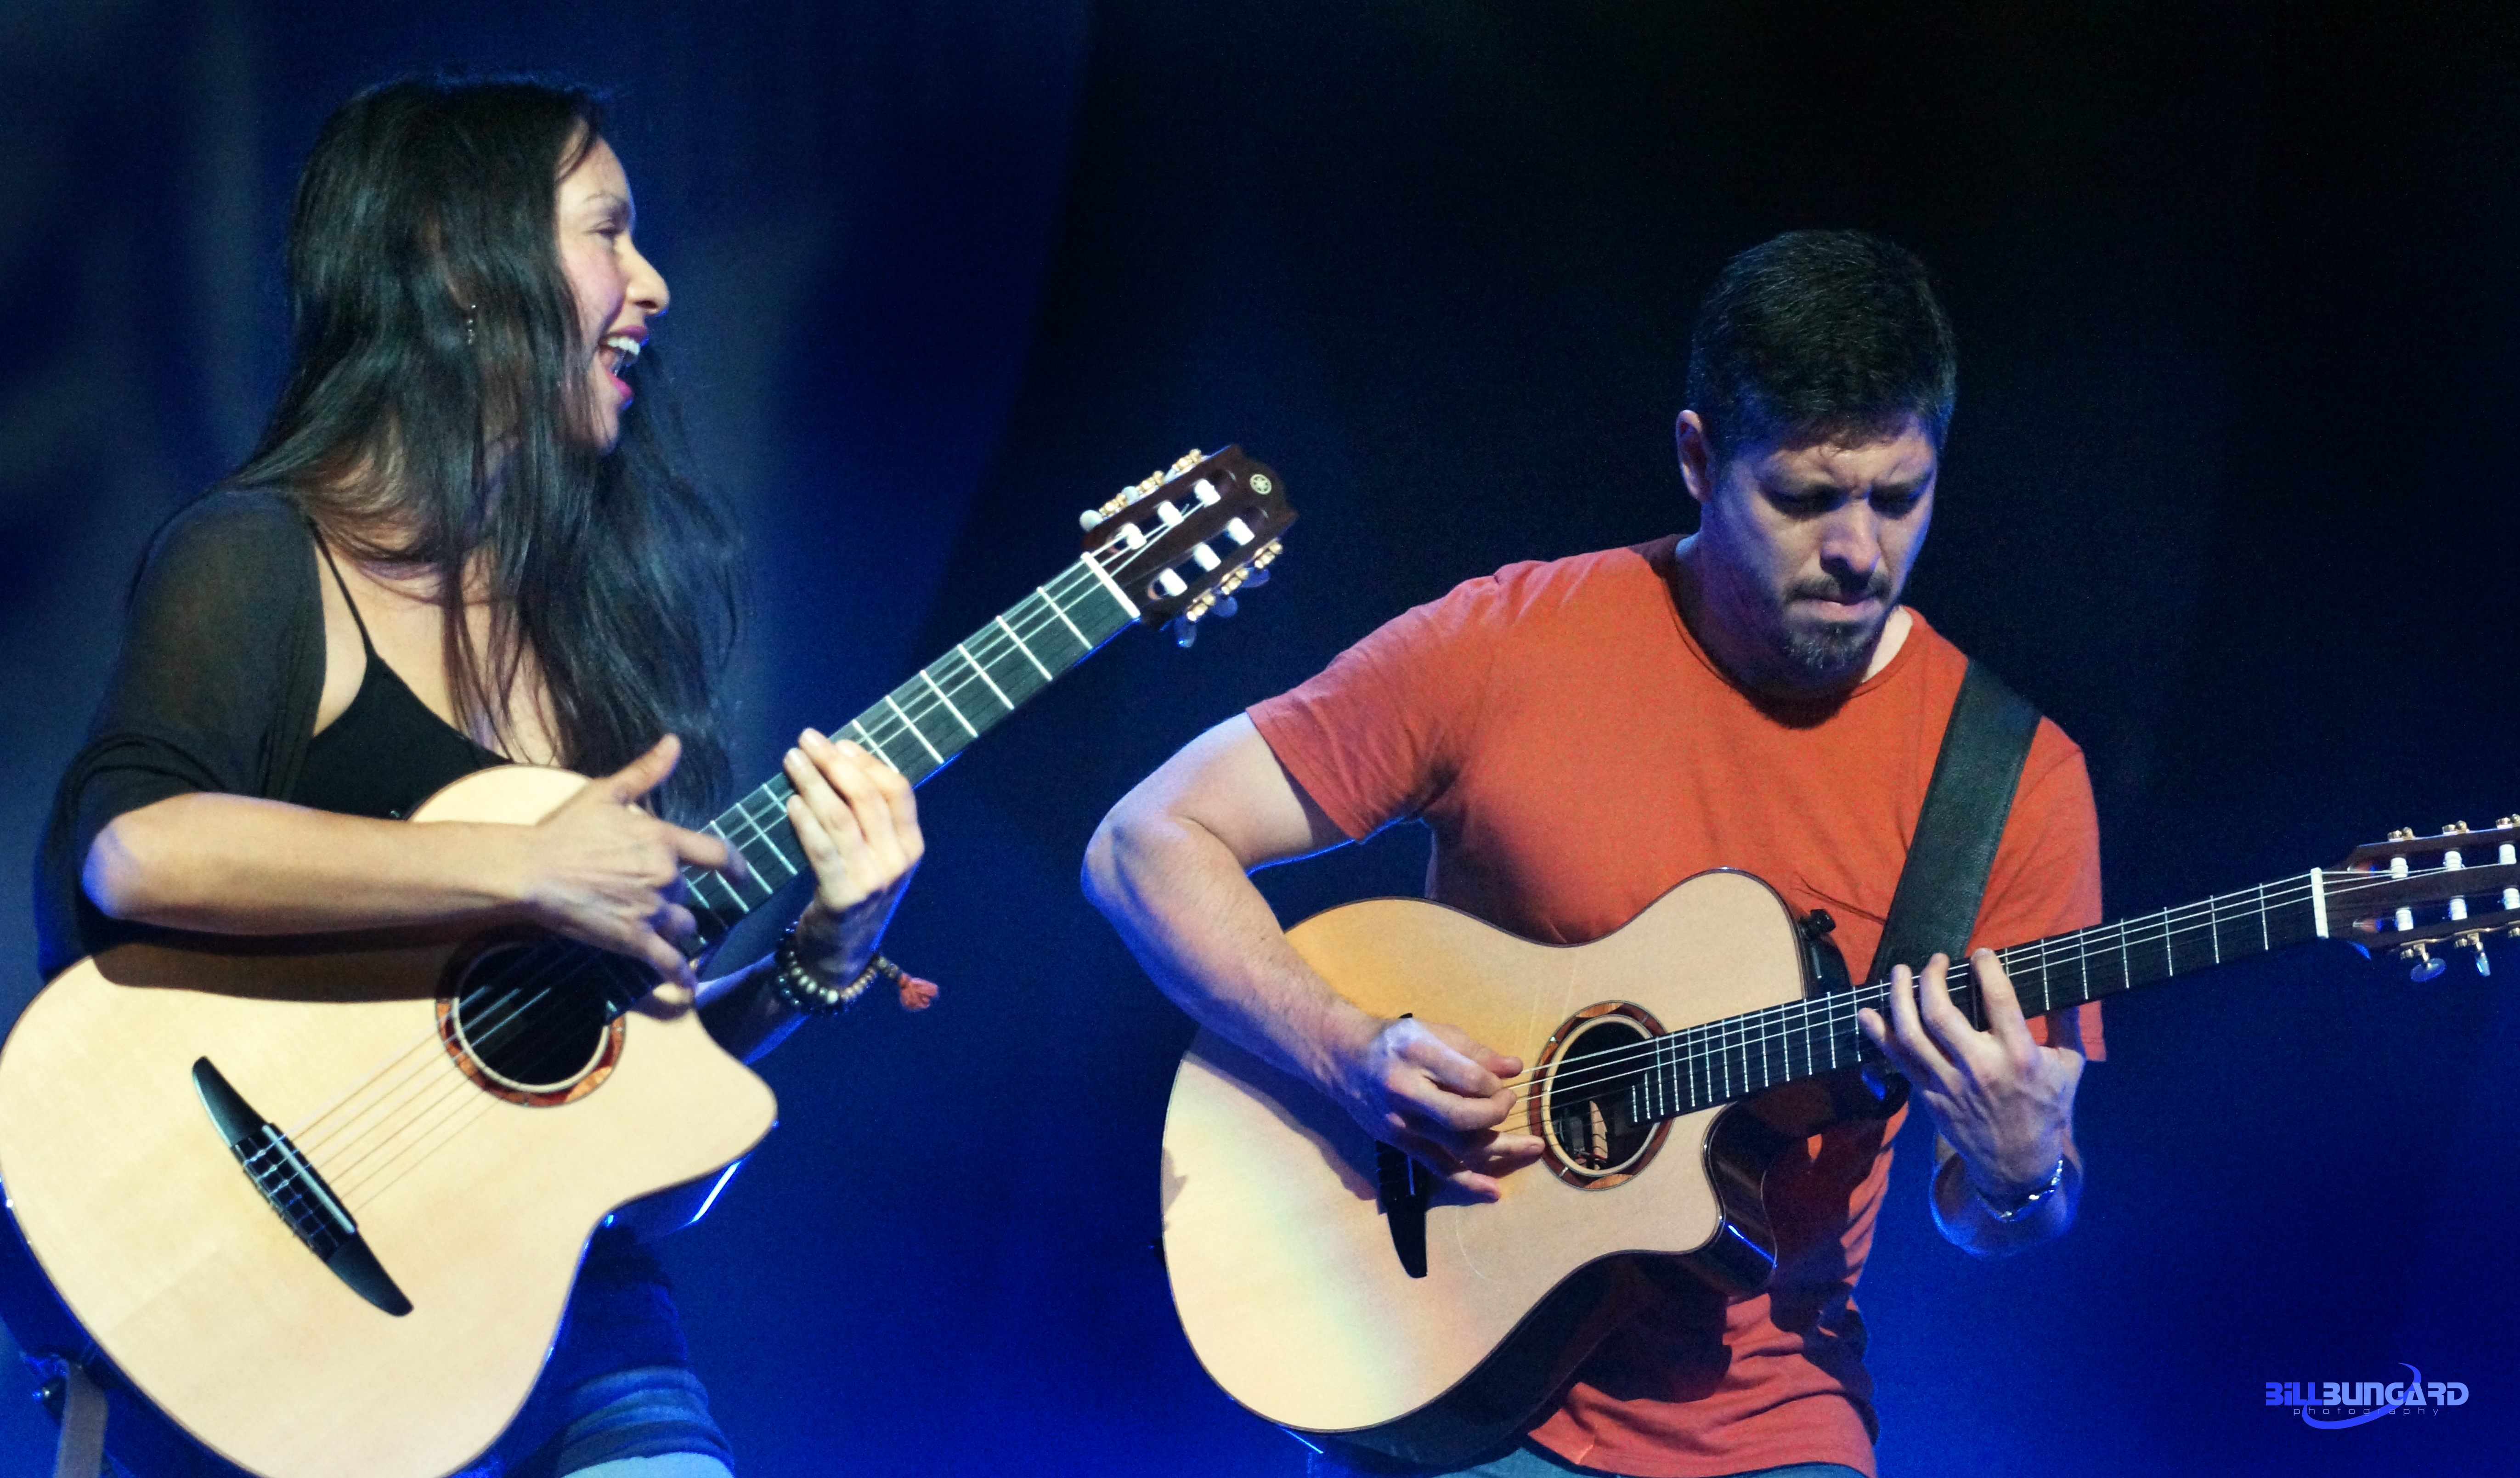 Rodrigo y Gabriela Live at The Paramount (Photo by Bill Bungard)